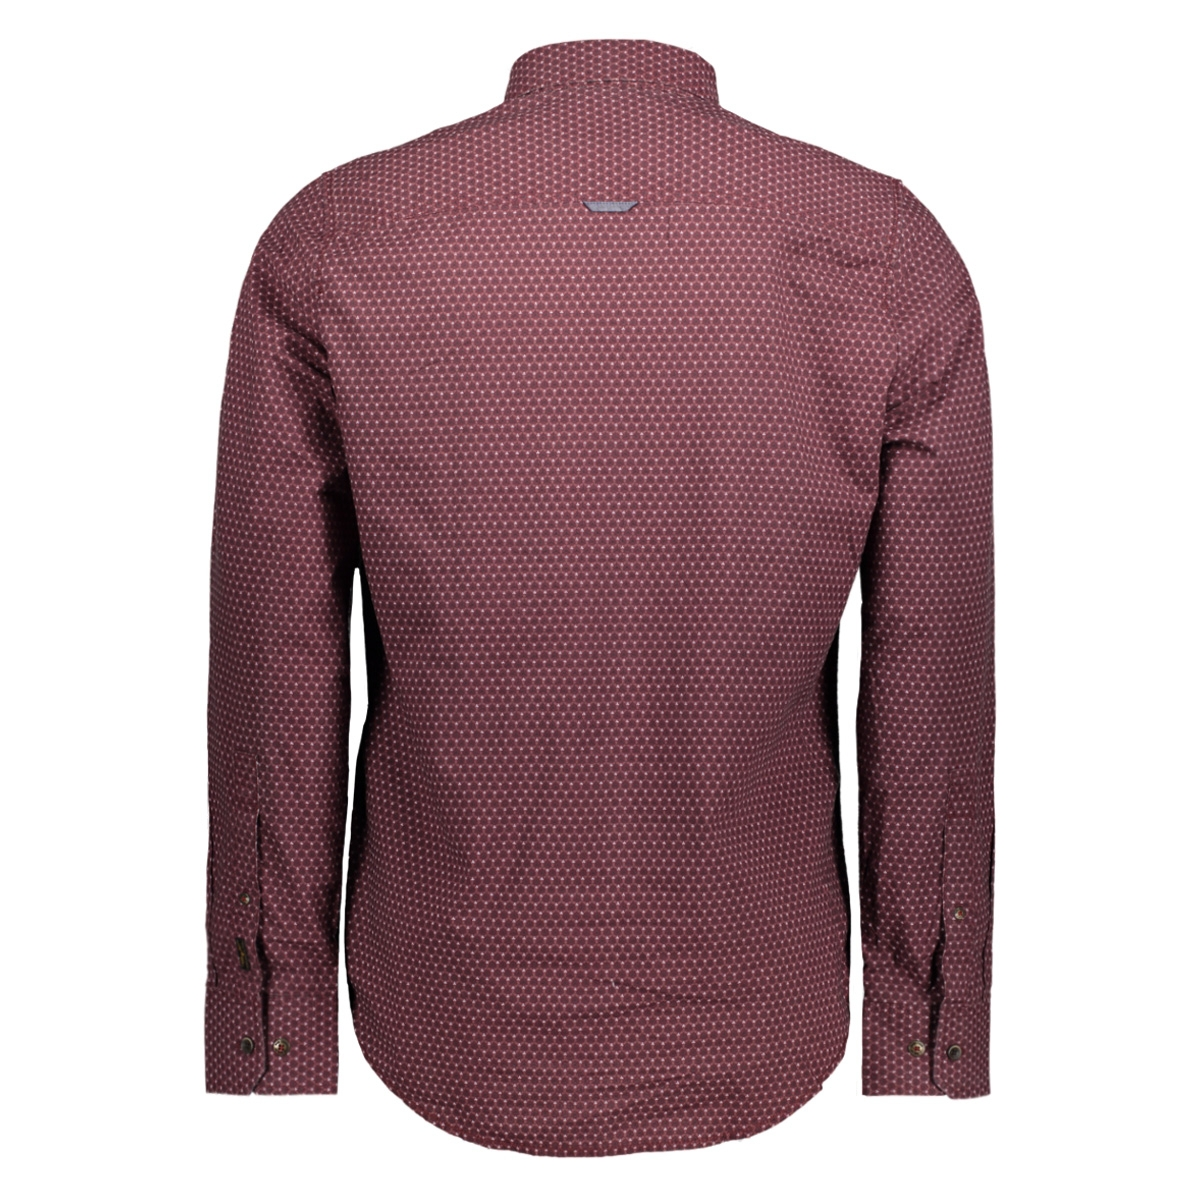 psi176249 pme legend overhemd 3831